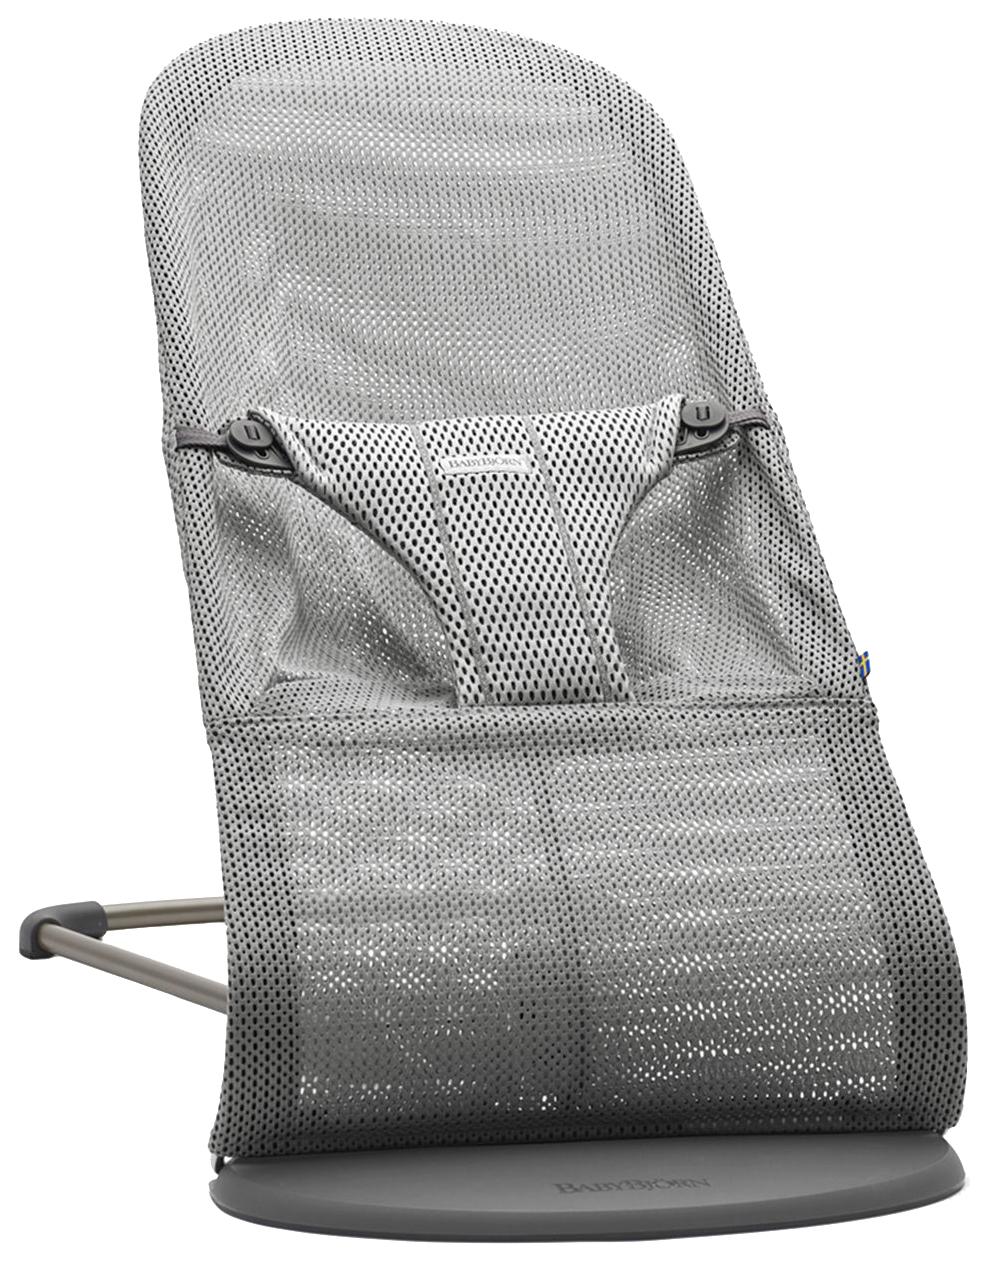 Кресло шезлонг Baby Bjorn Bliss Mesh серый